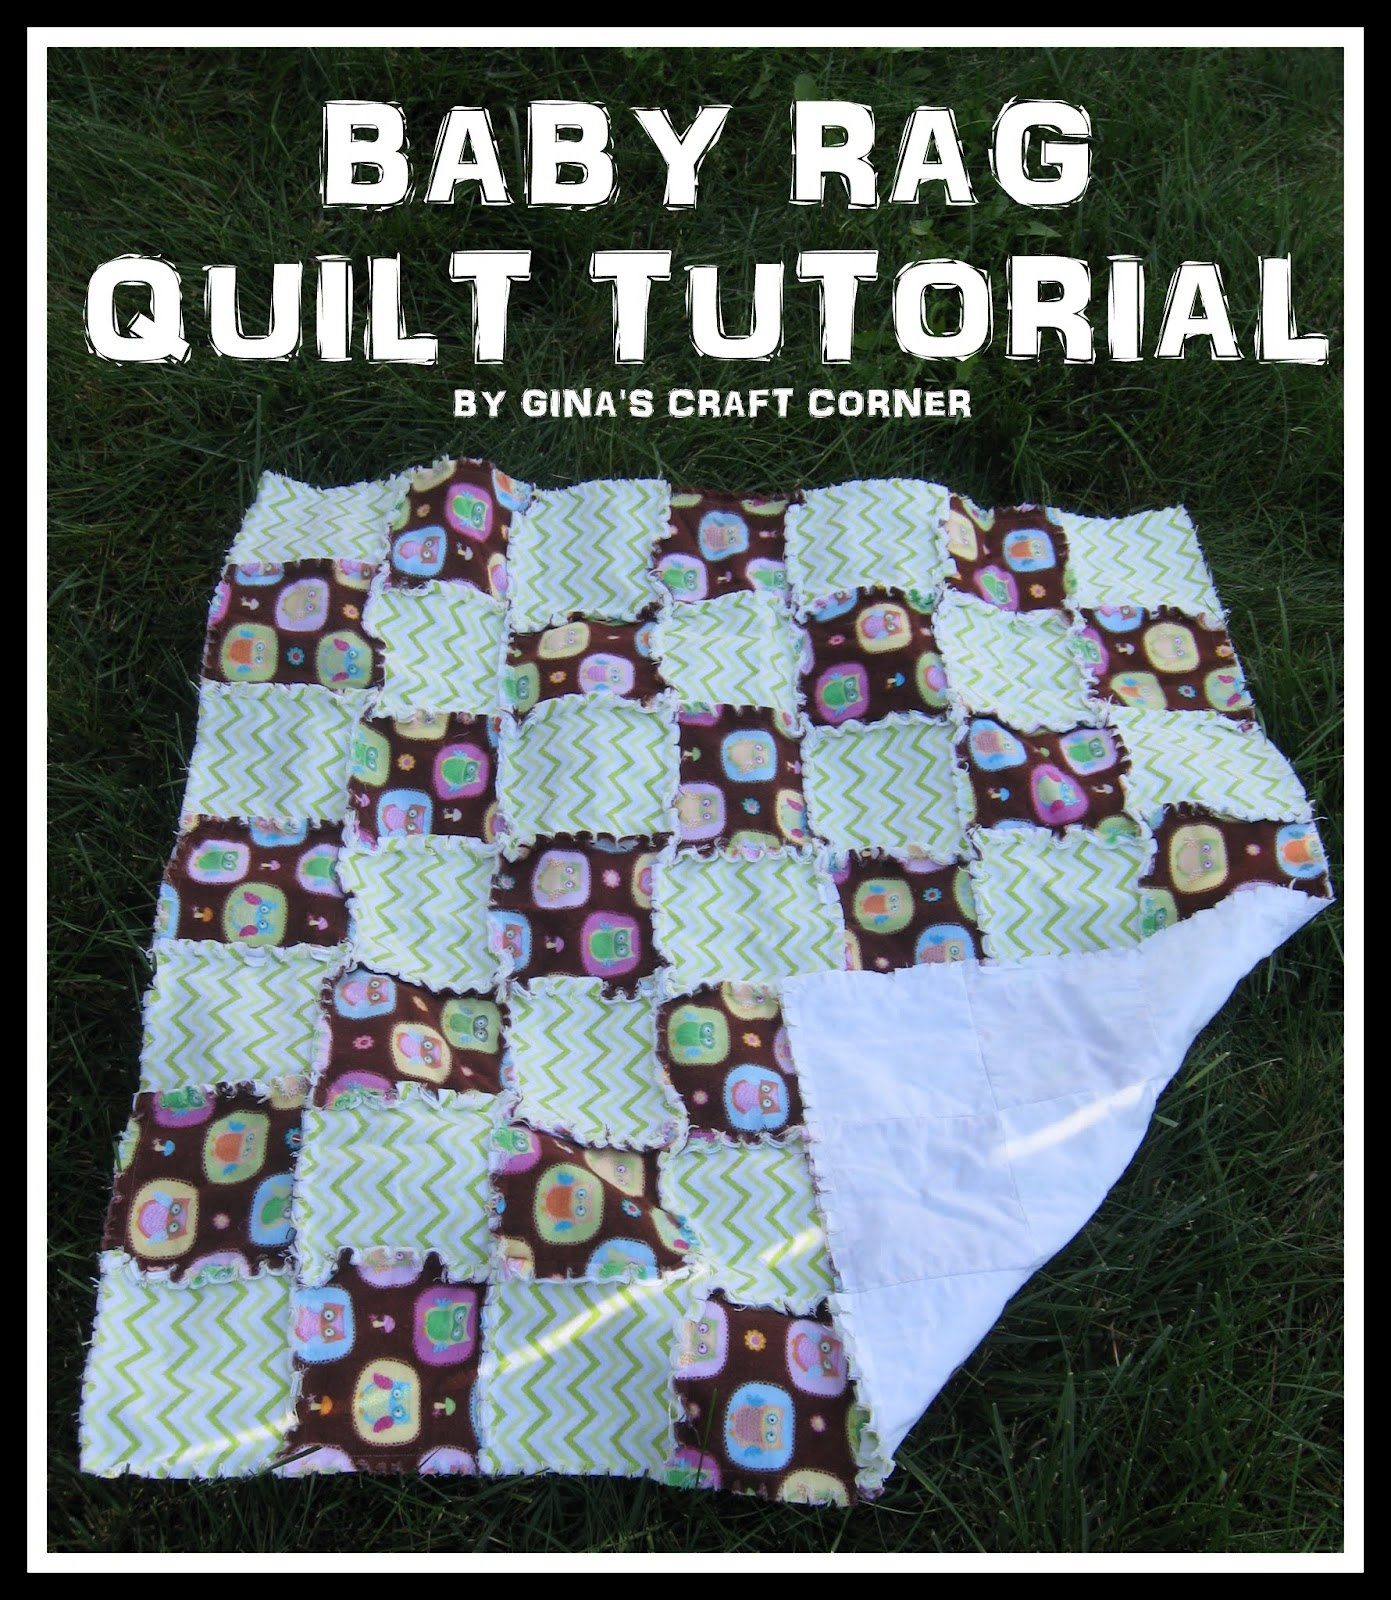 Gina s Craft Corner: Baby Rag Quilt Tutorial